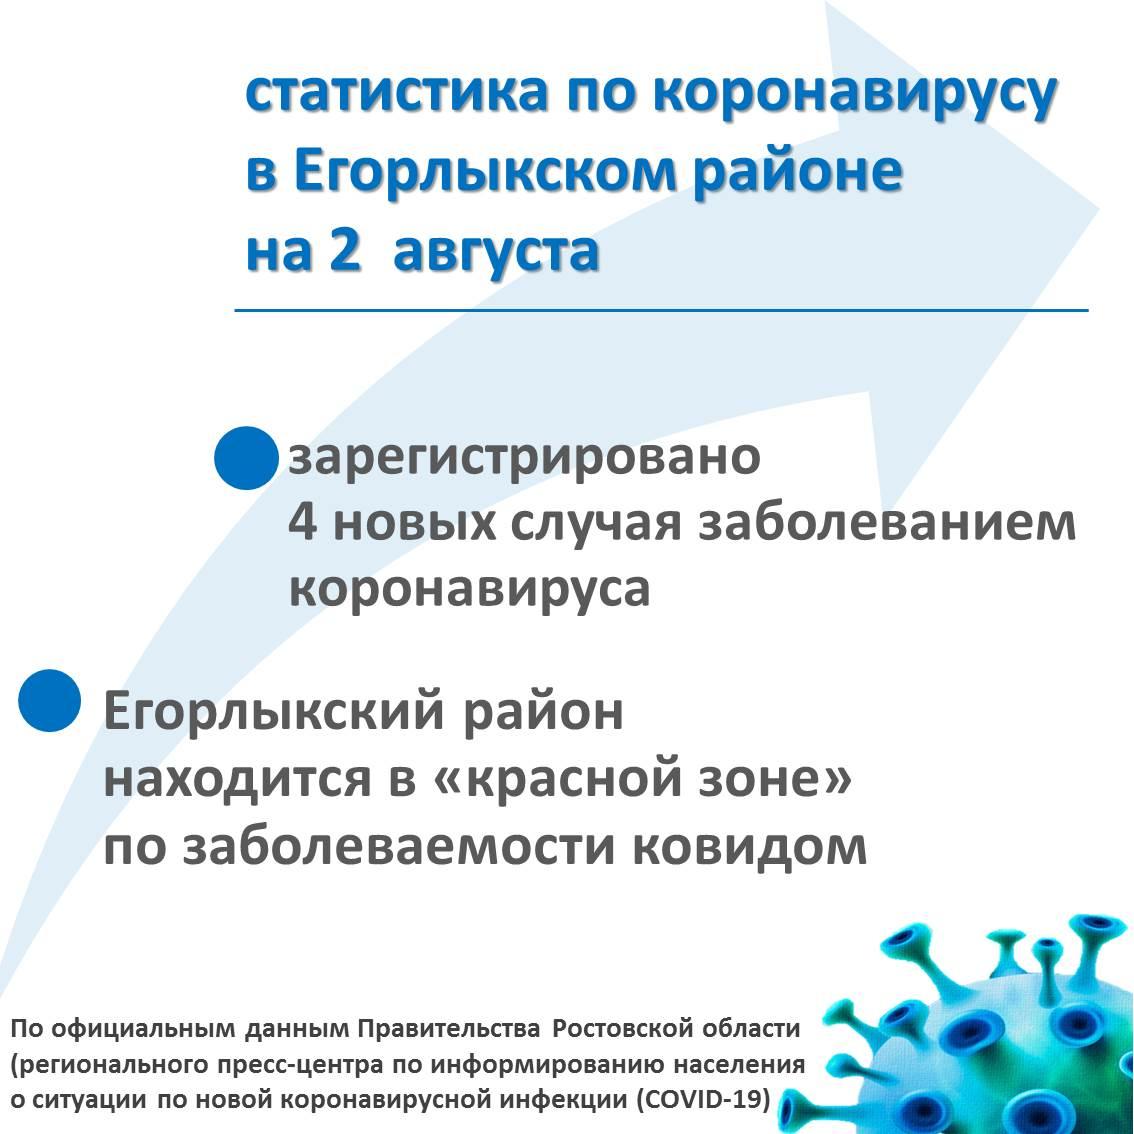 Статистика по коронавирусу в Егорлыкском районе на 2 августа